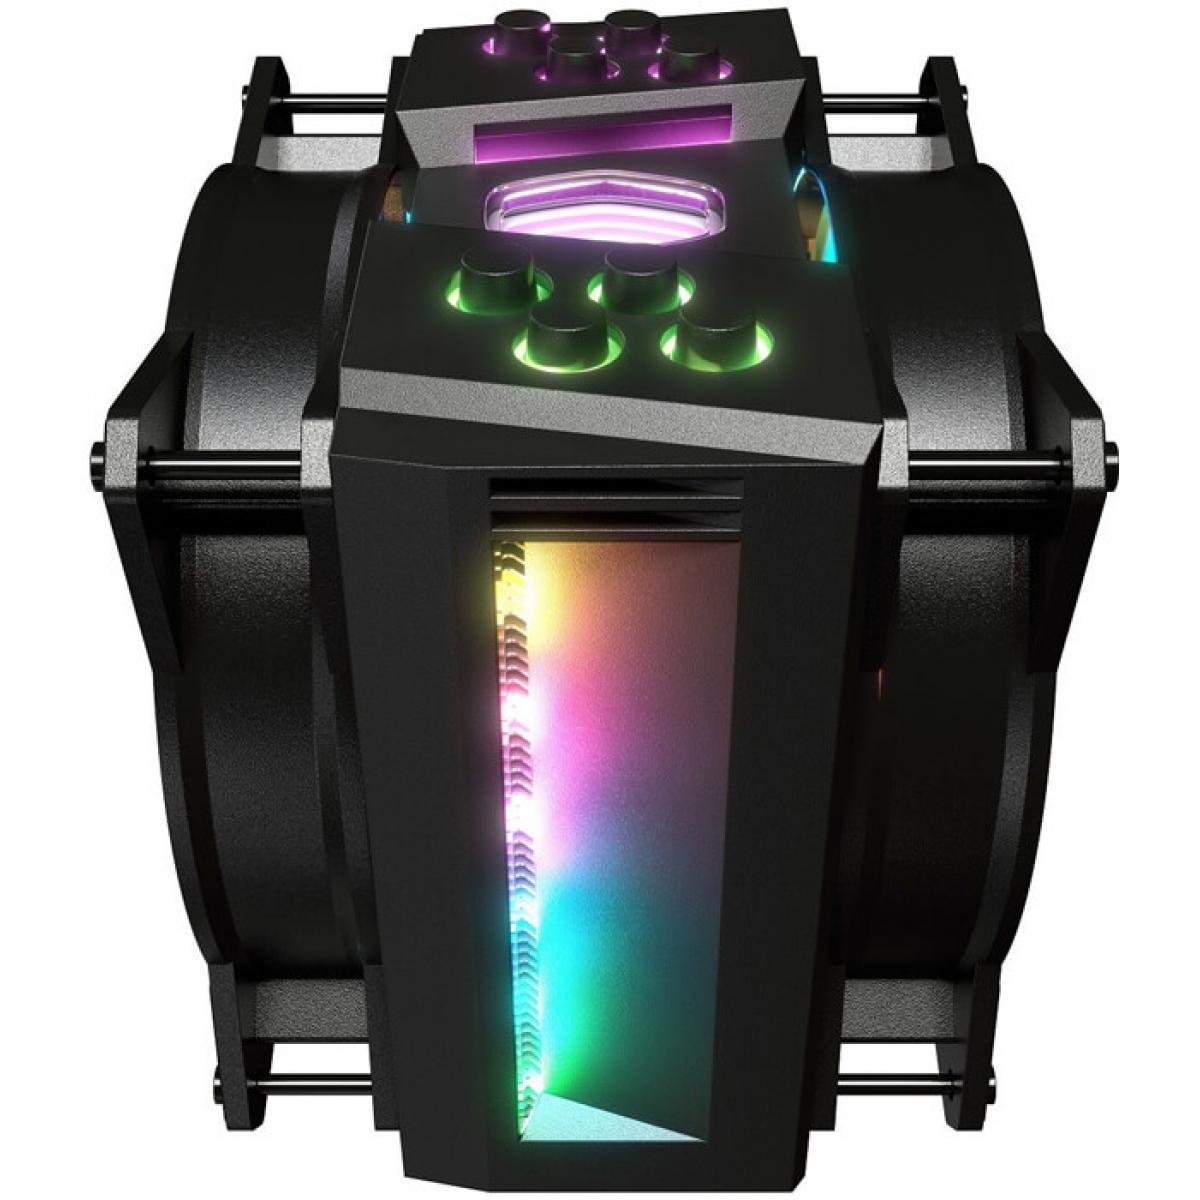 Cooler para Processador Cooler Master Masterair MA410M RGB 120mm, Intel-AMD, MAM-T4PN-218PC-R1